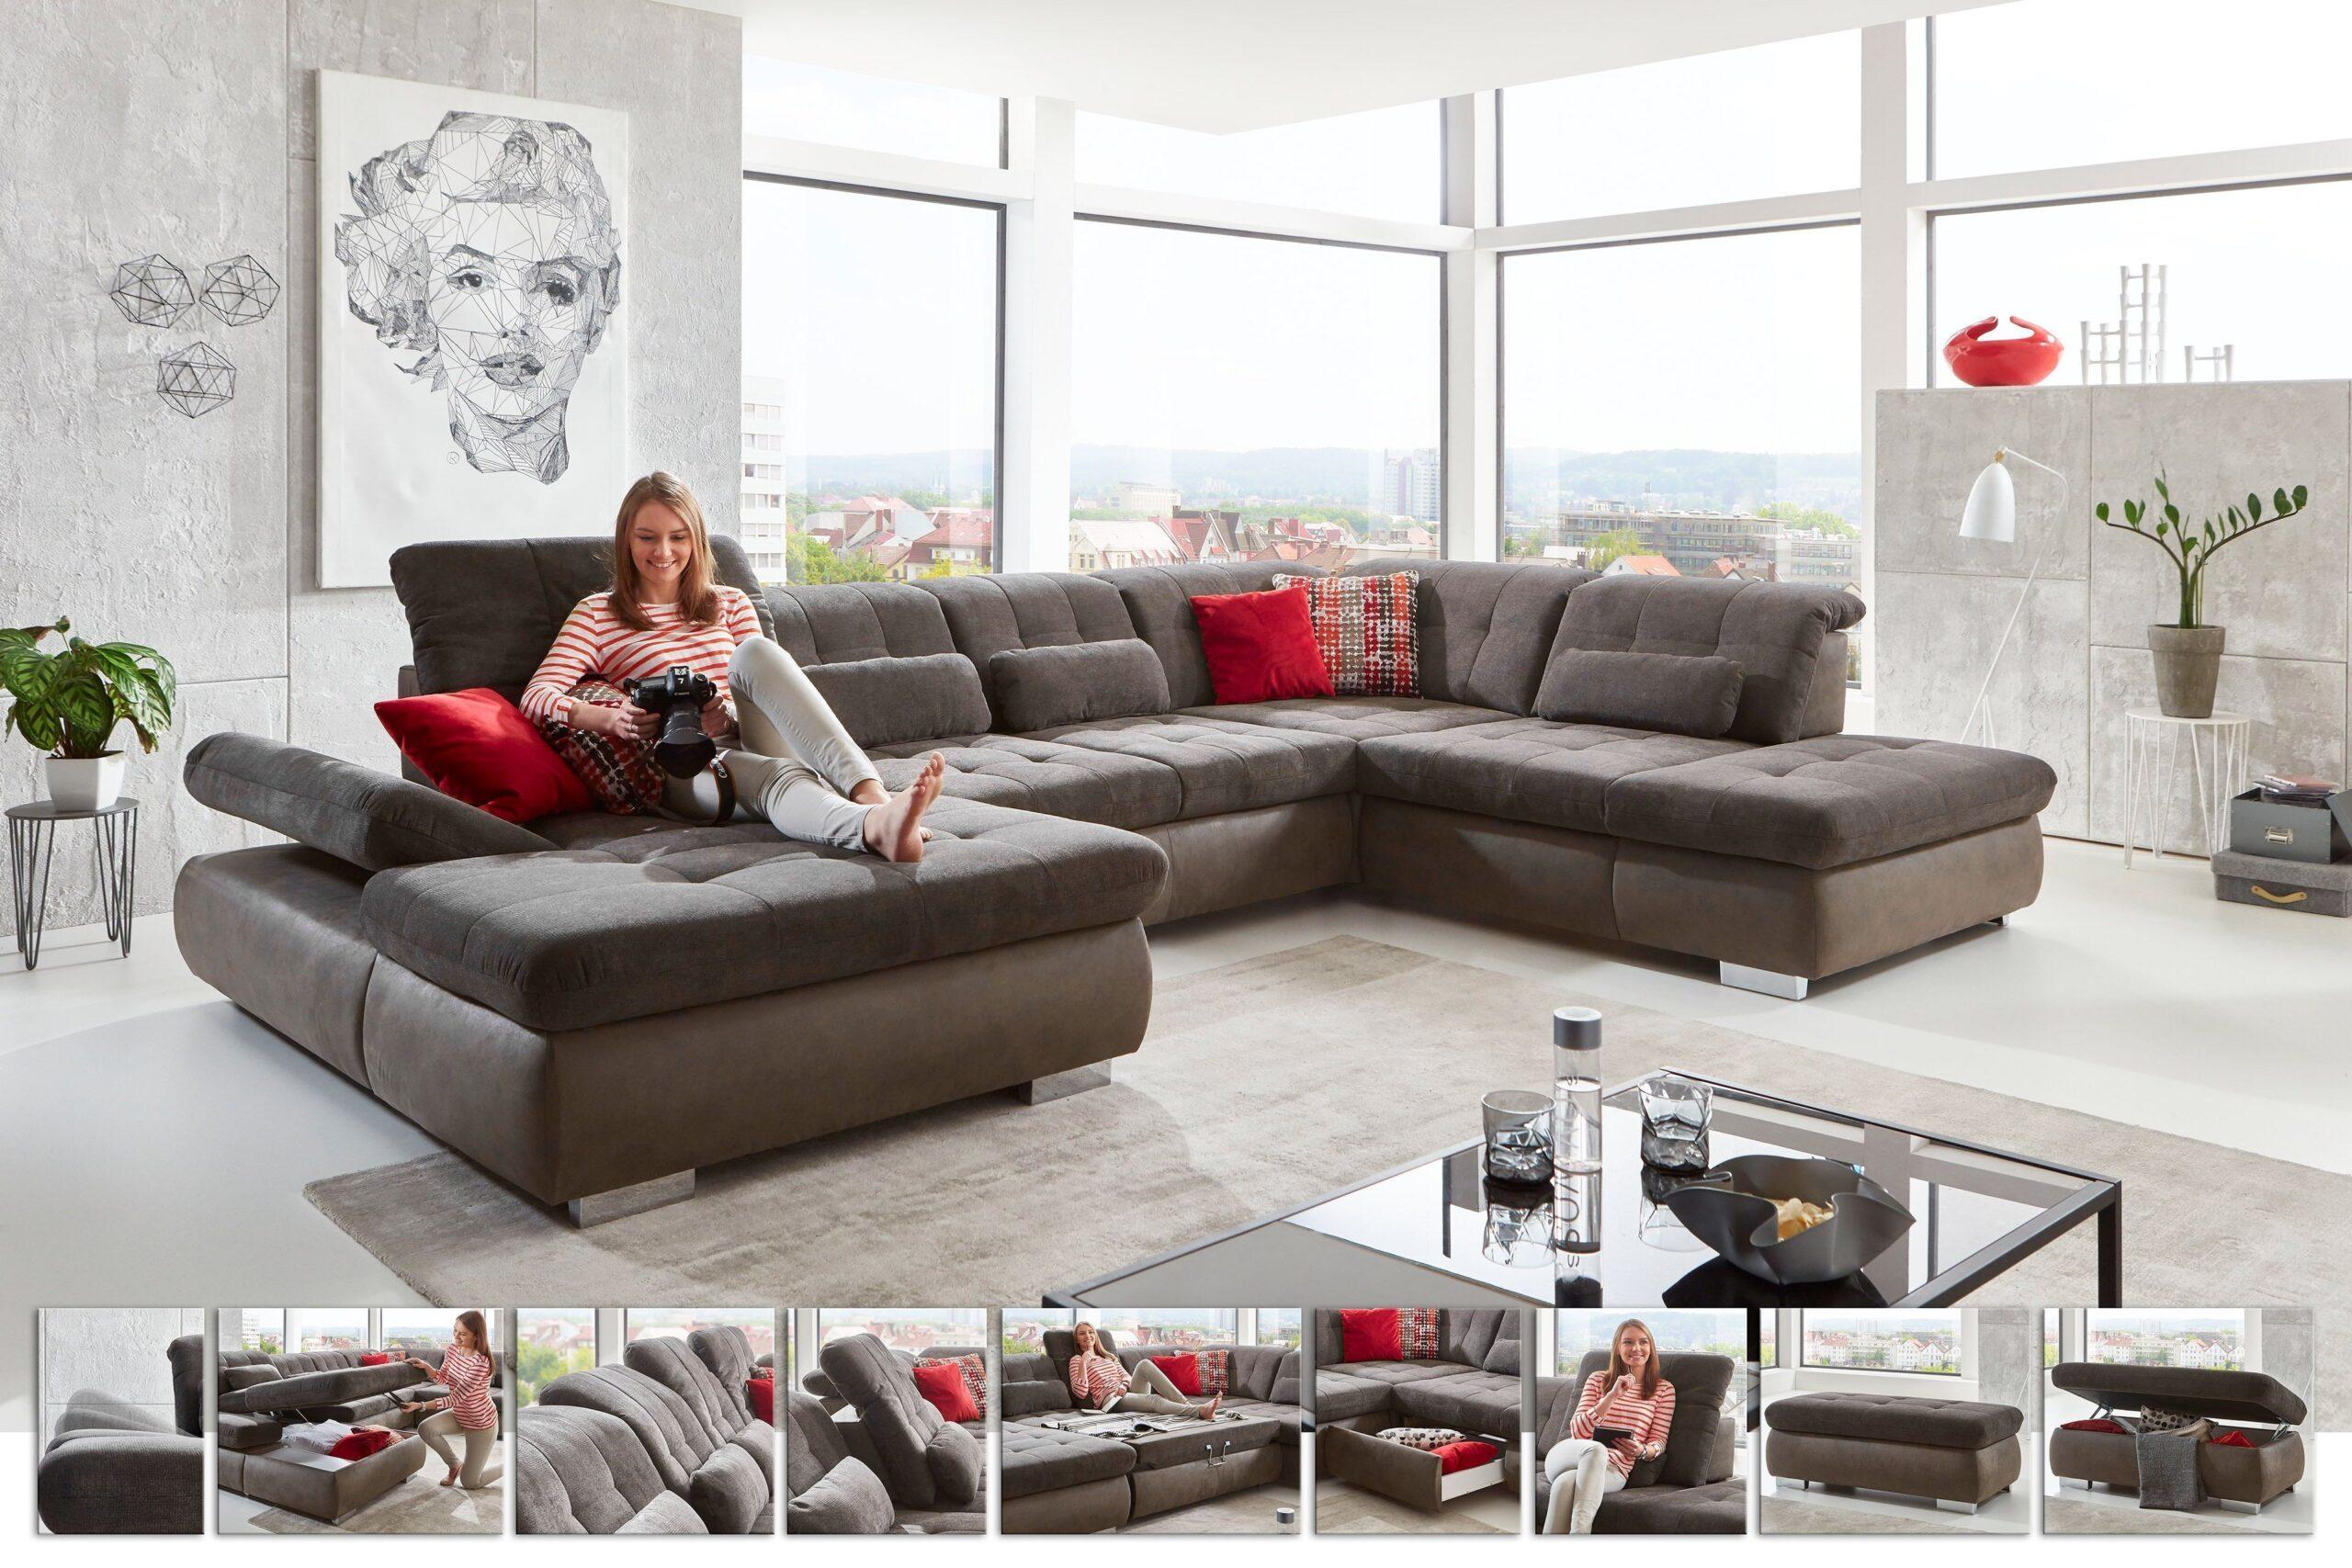 Full Size of Megapol Sofa Konfigurator Couch Argo Judy Satellite Push Armstrong Stadion Message Stage Xxl Anthrazit Slate Mbel Letz Ihr Online Shop Mit Recamiere Günstiges Sofa Megapol Sofa